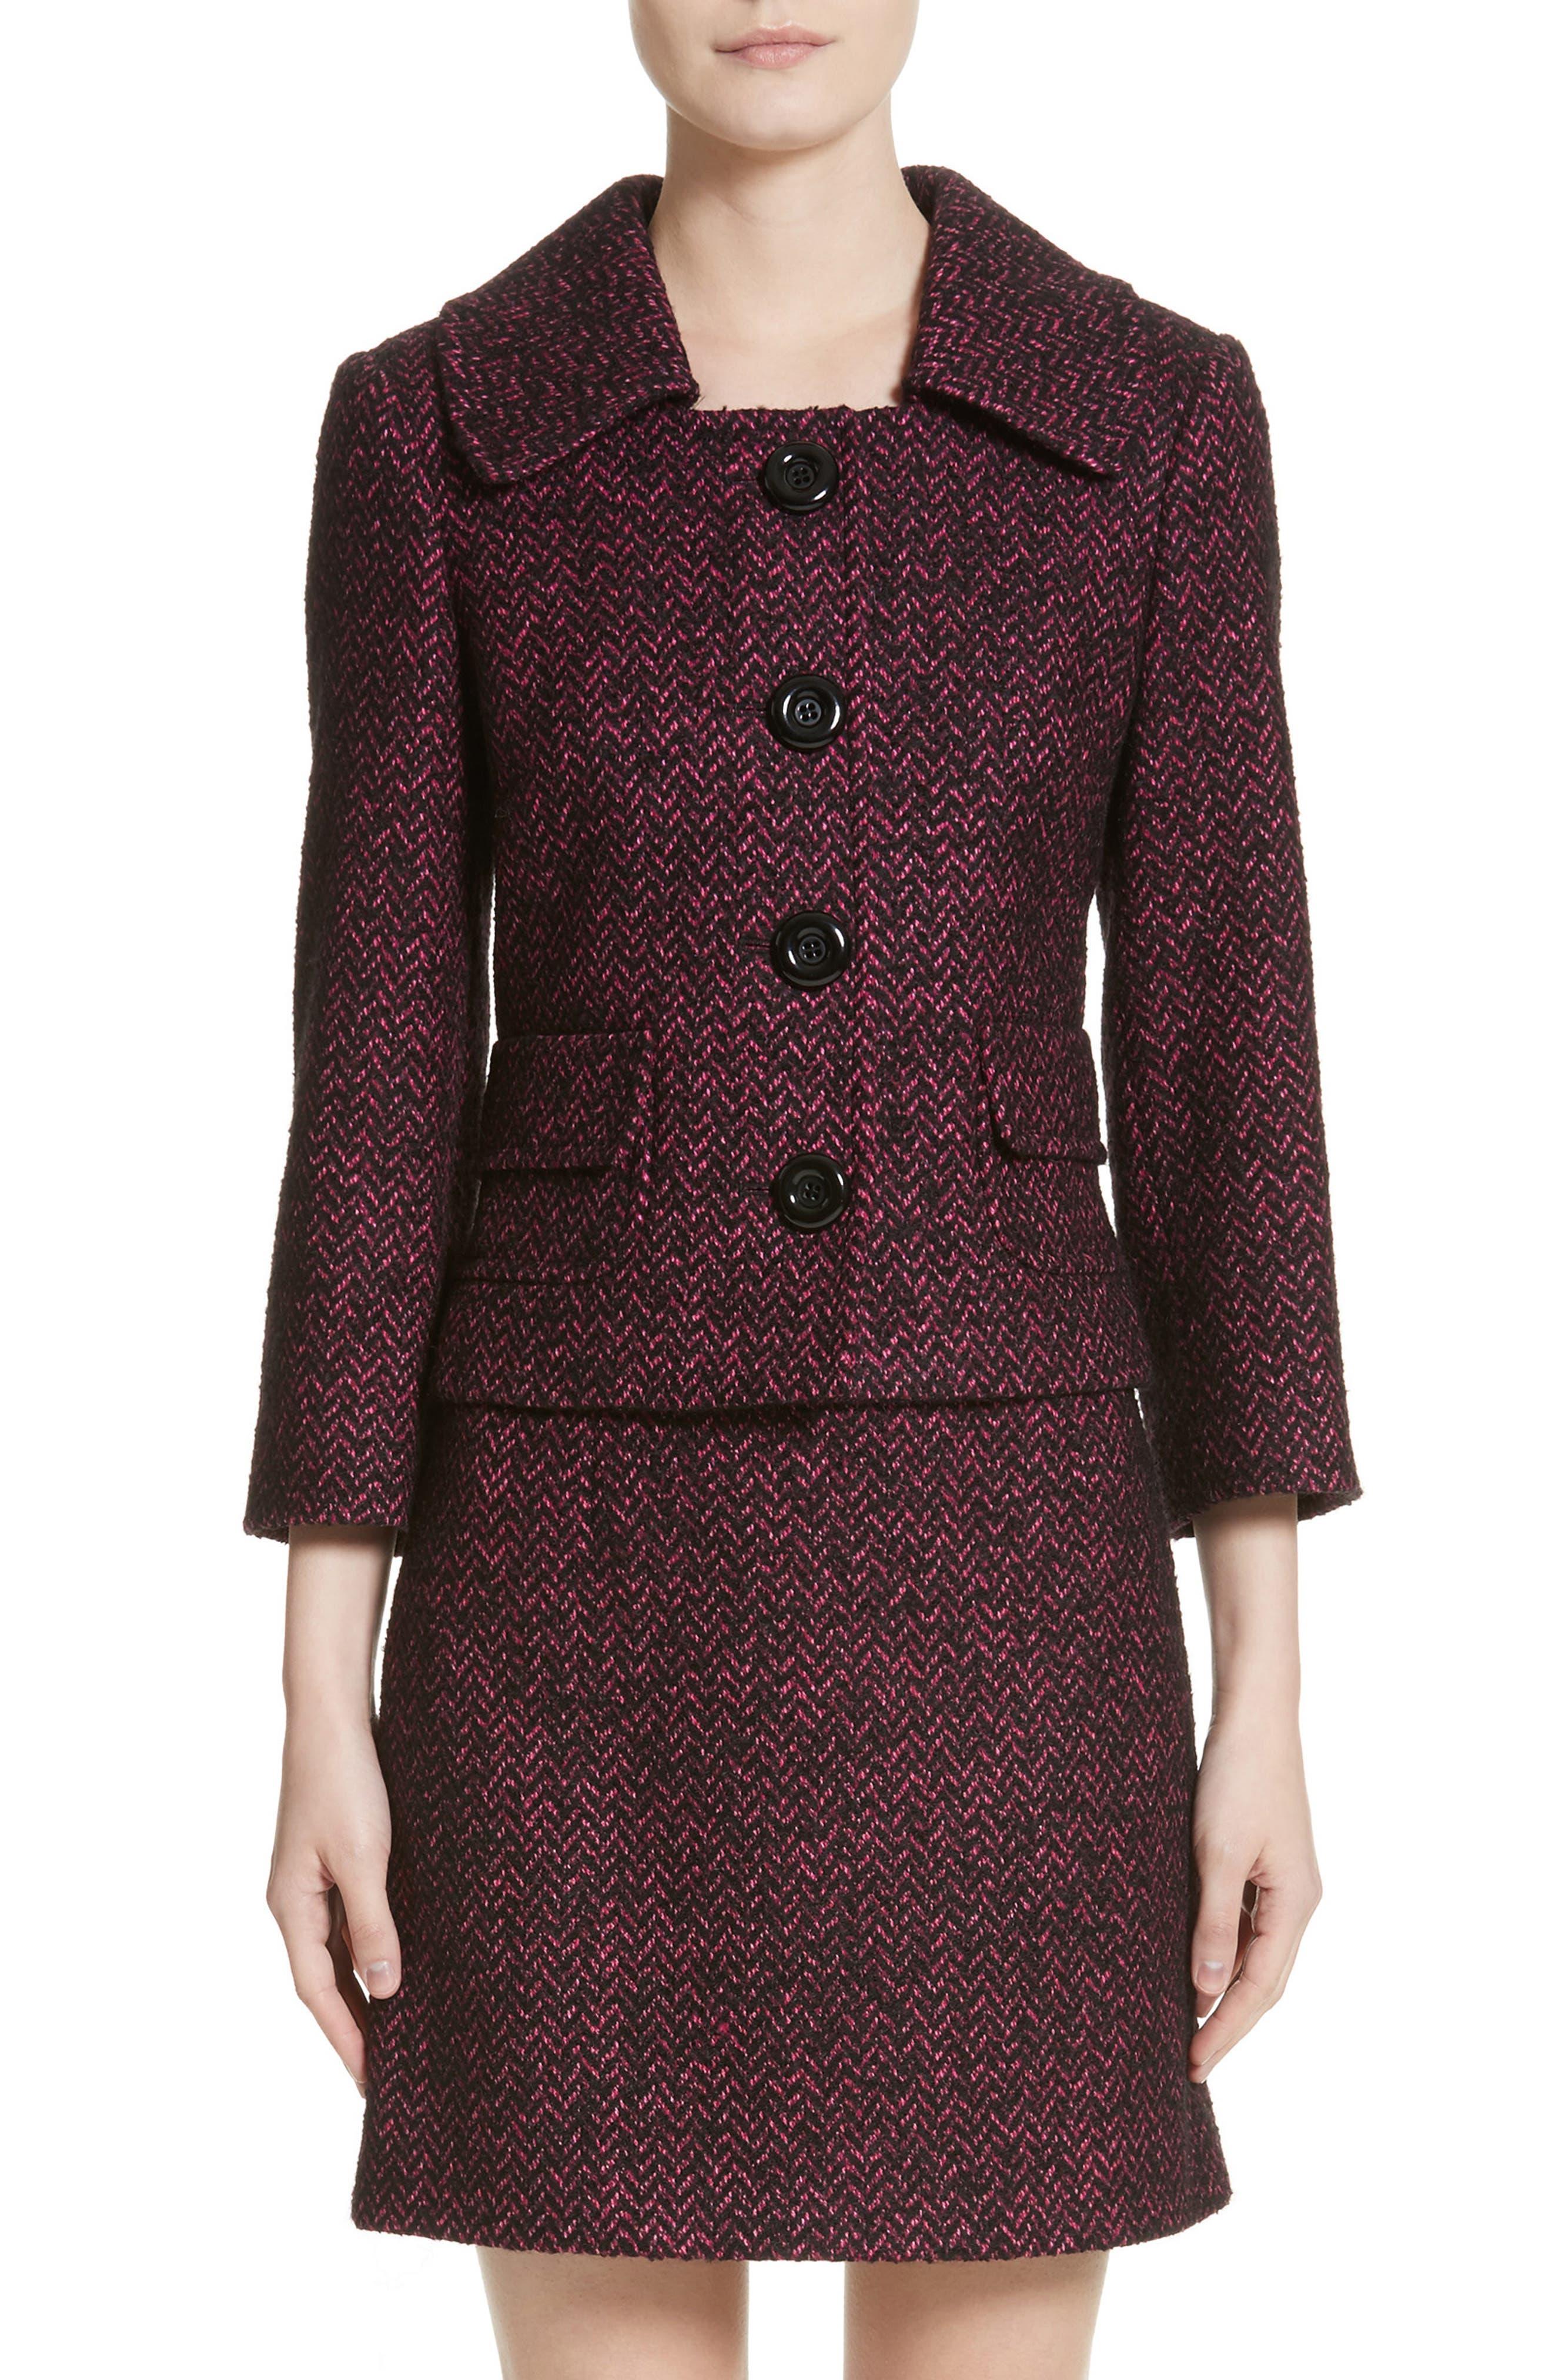 Herringbone Wool Blend Jacket,                             Main thumbnail 1, color,                             658